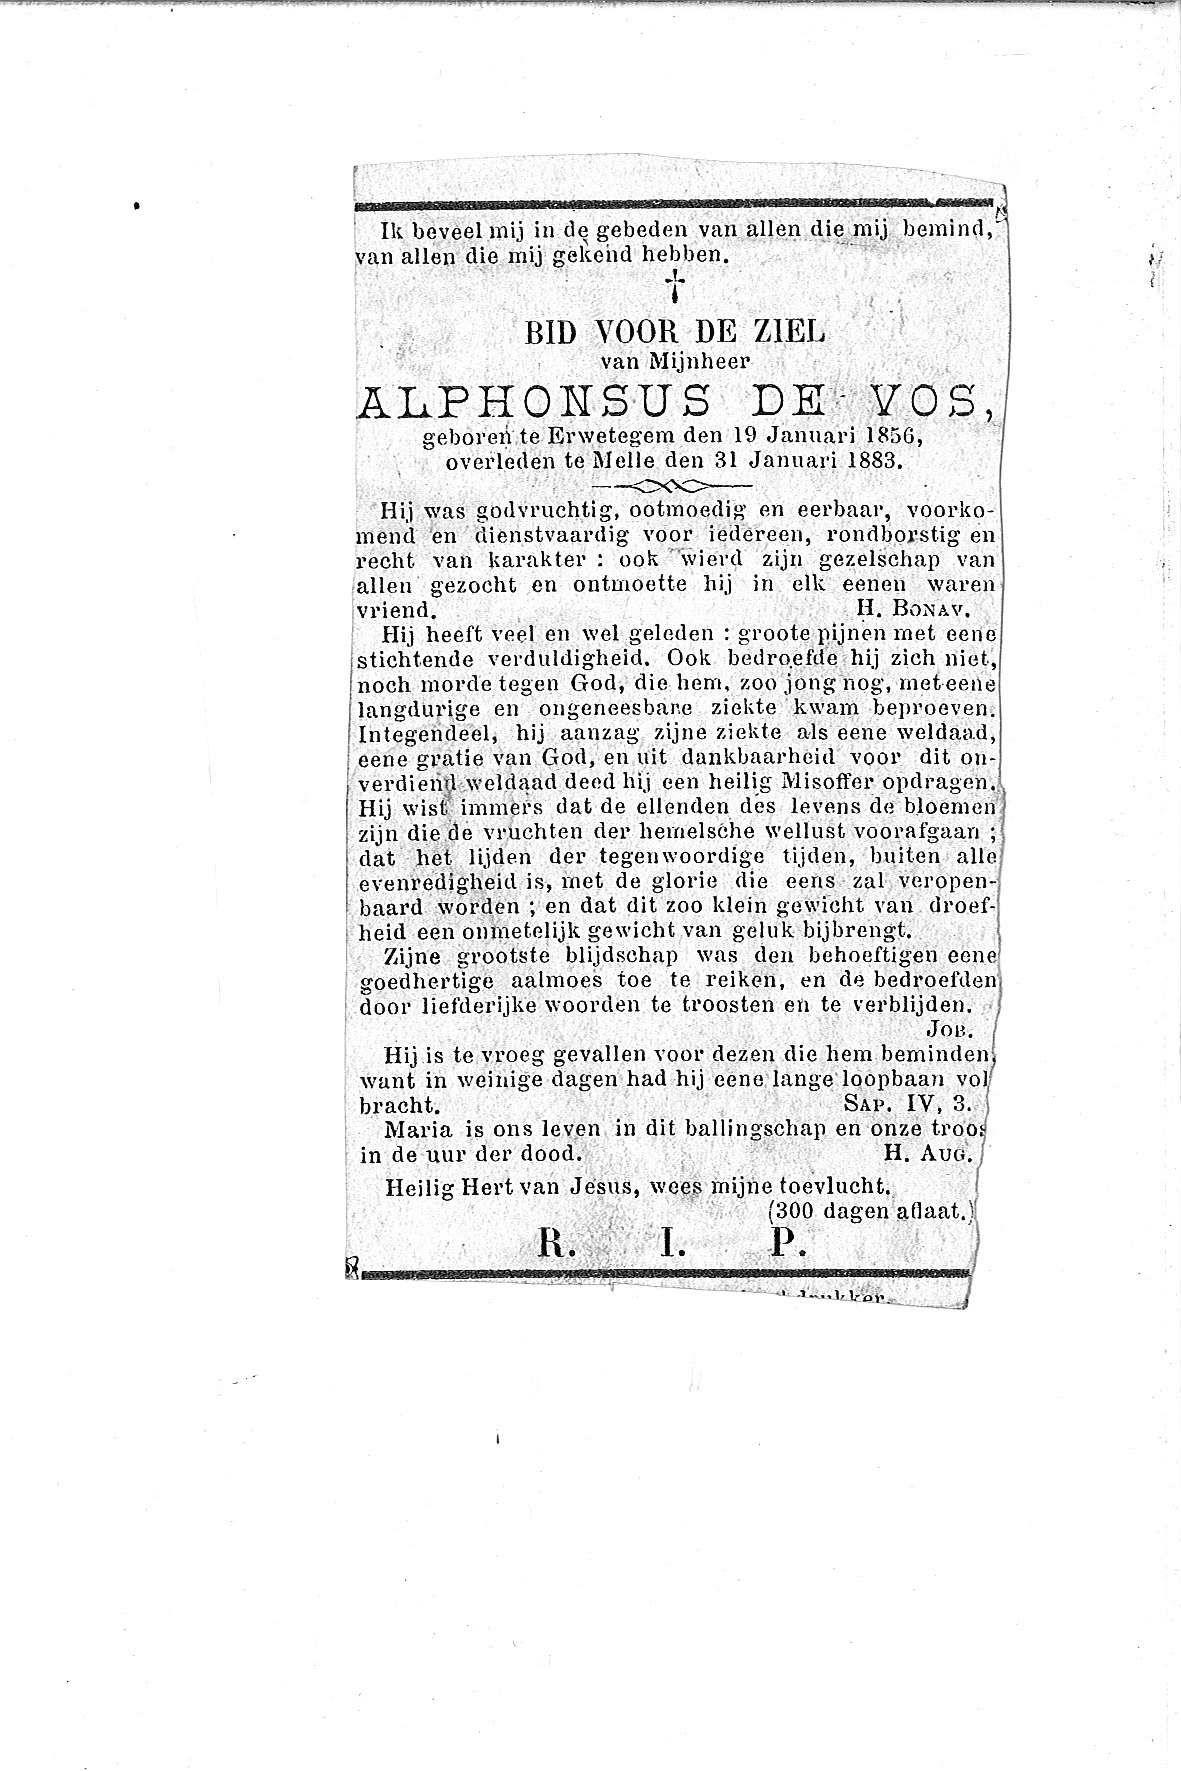 Alphonsus (1883) 20120305091540_00012.jpg